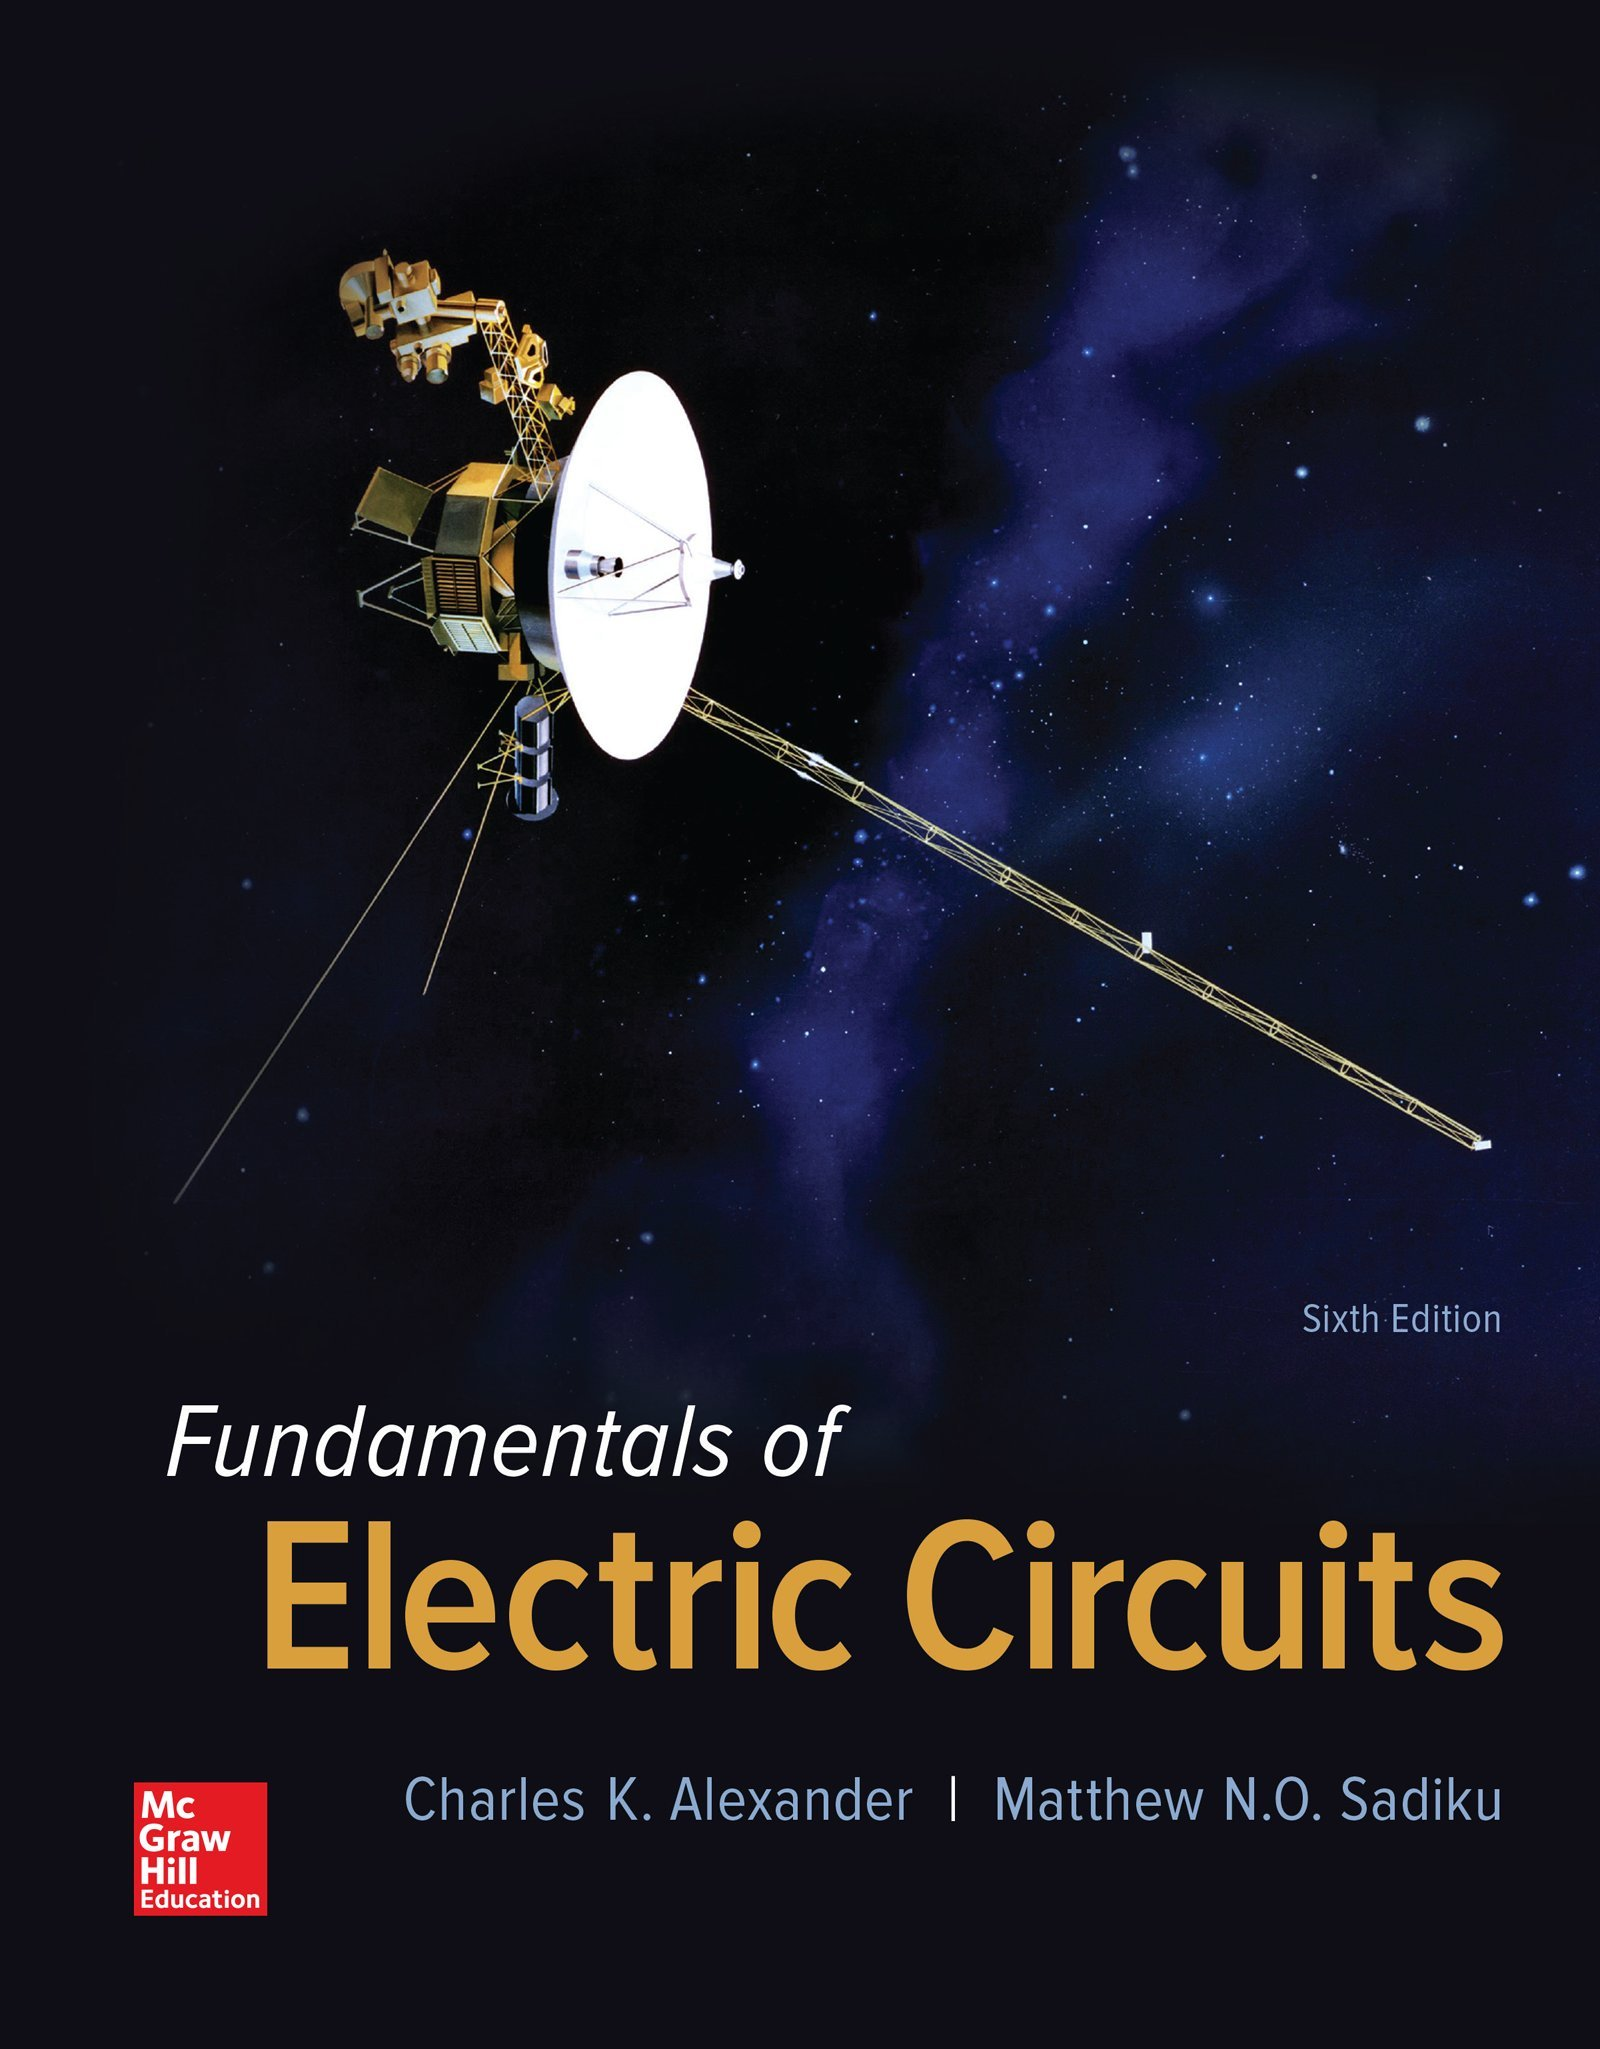 fundamentals of electric circuits charles k alexander, matthewfundamentals of electric circuits 6th edition